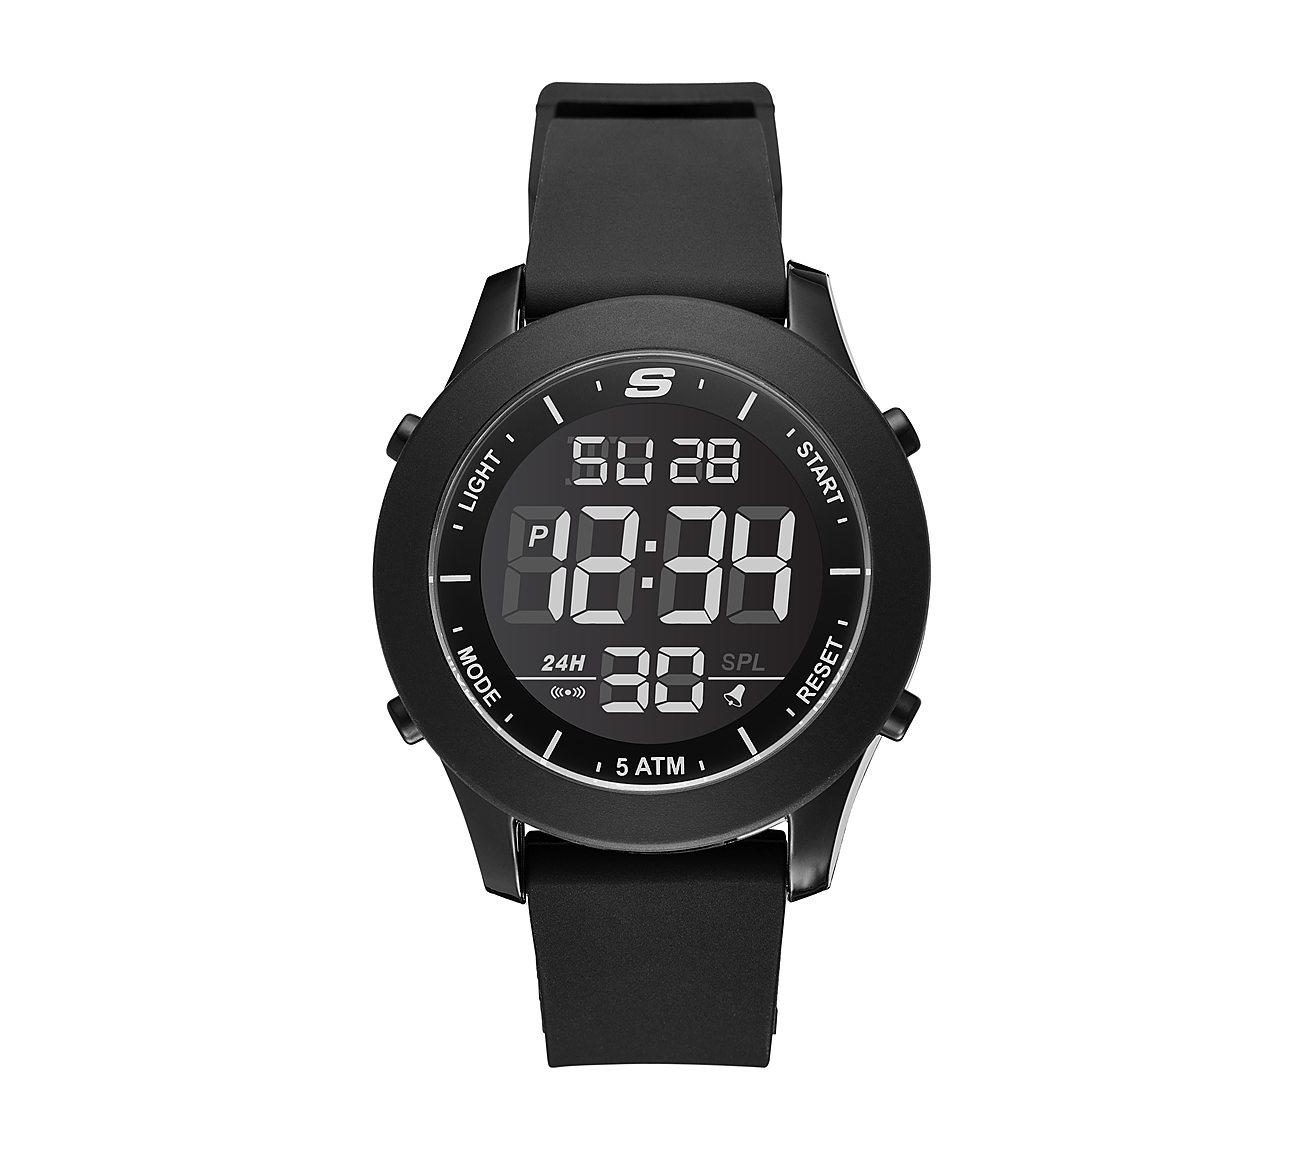 Rosencrans Oversize Digital Watch